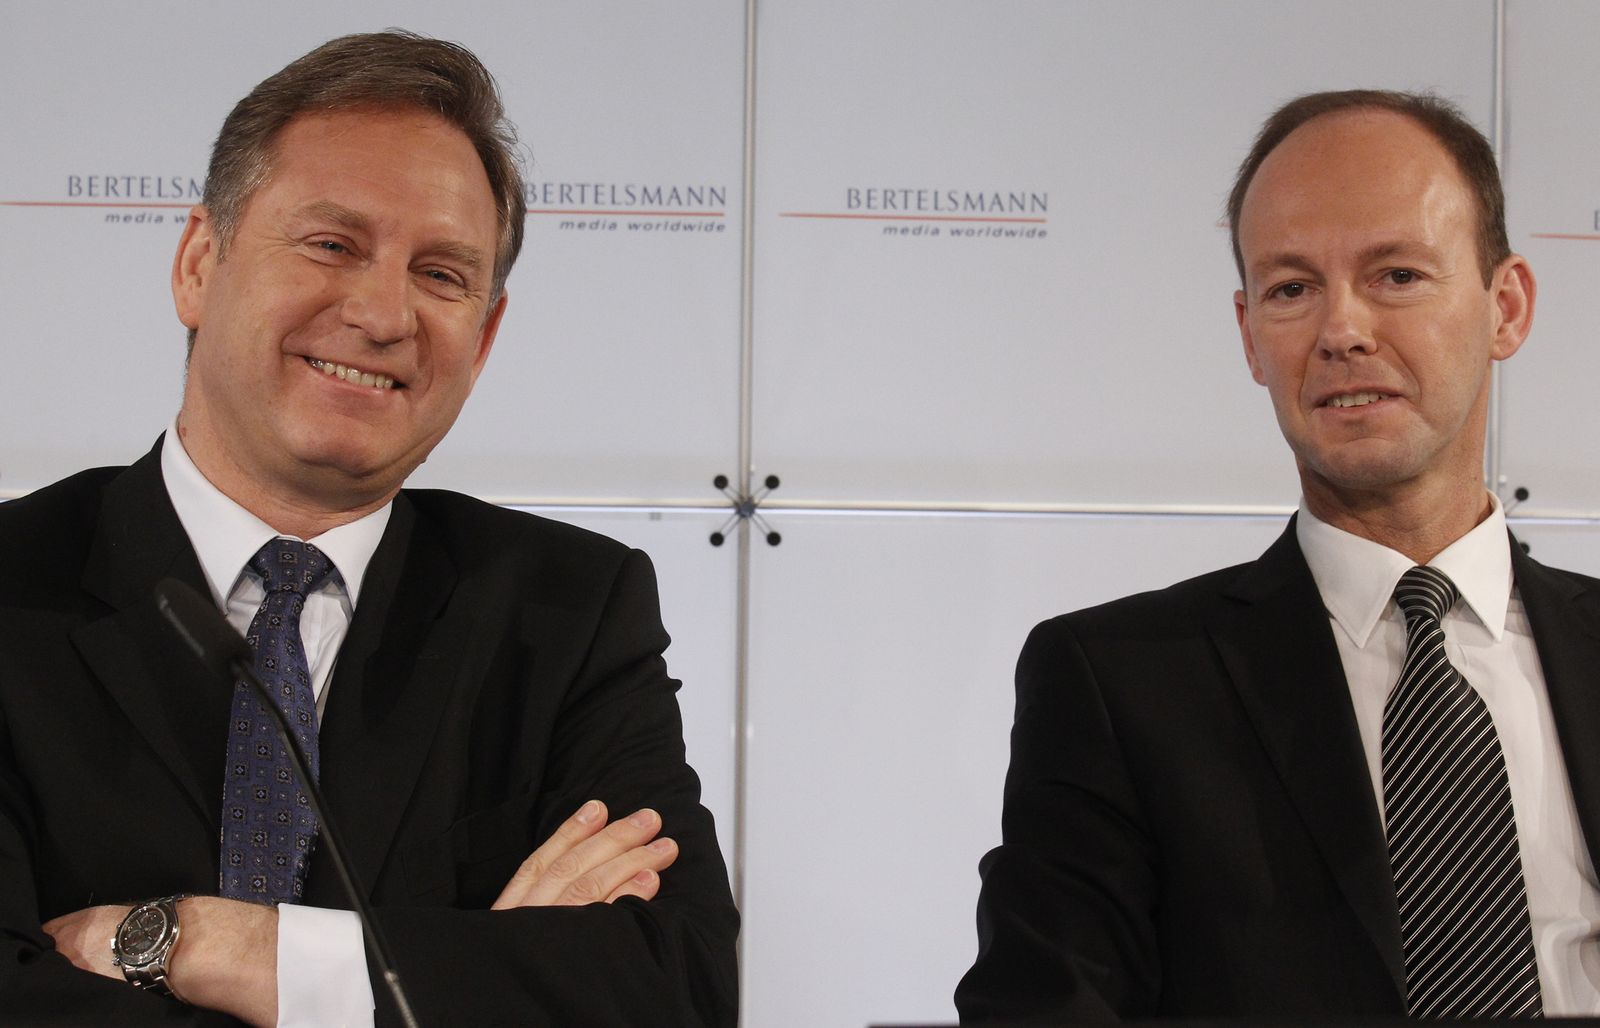 Thomas Rabe / Bertelsmann